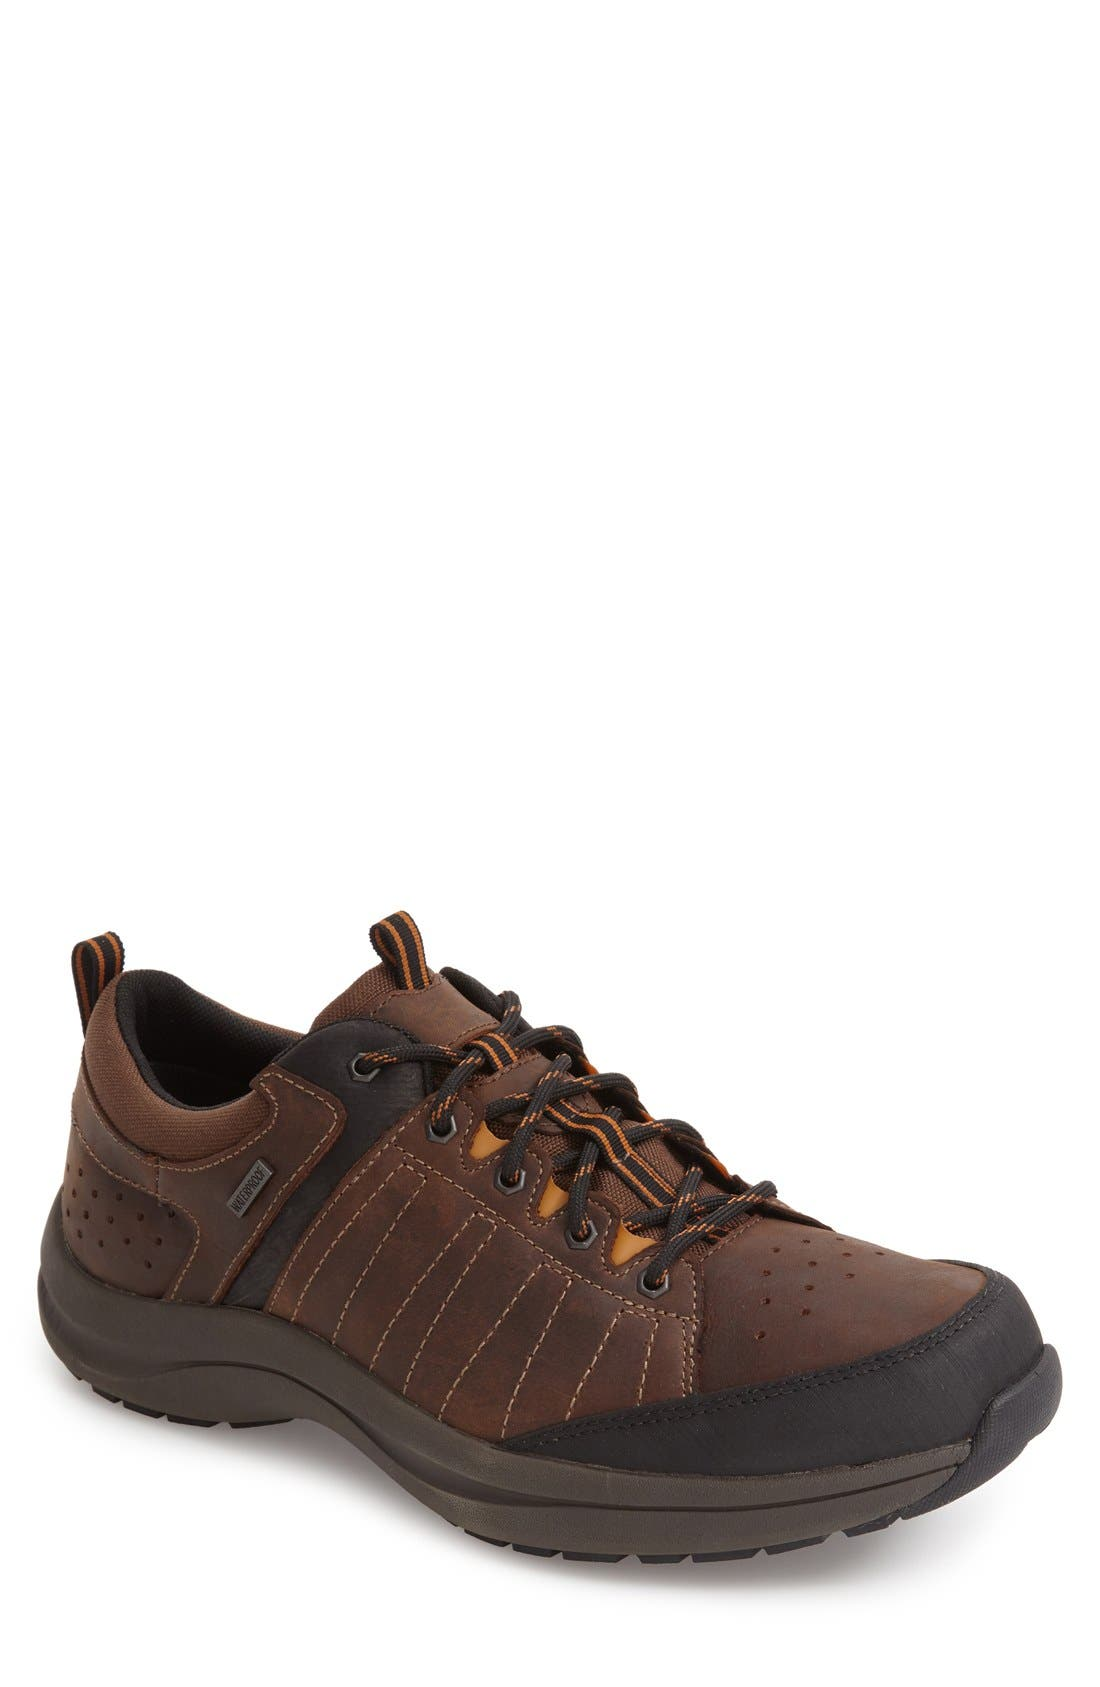 Dunham Seth-Dun Waterproof Sneaker